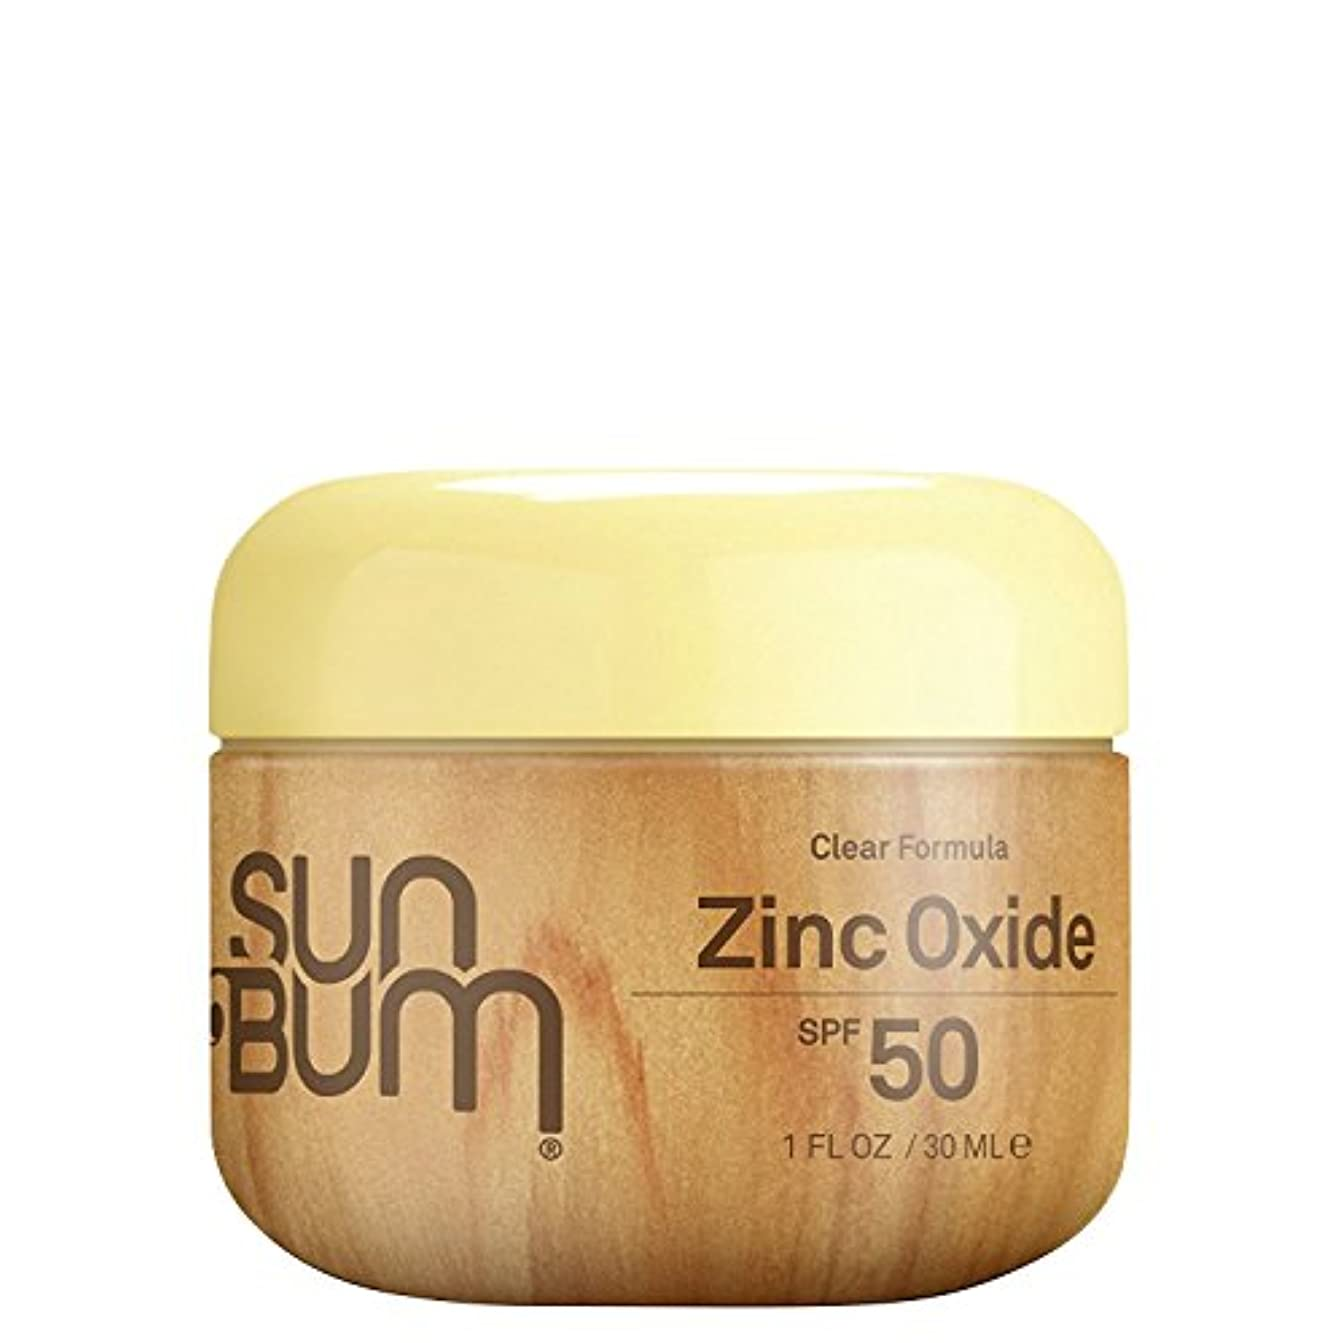 Sun Bum SPF 50 vxfqbサンスクリーンクリア酸化亜鉛ローション、1オンス4パック